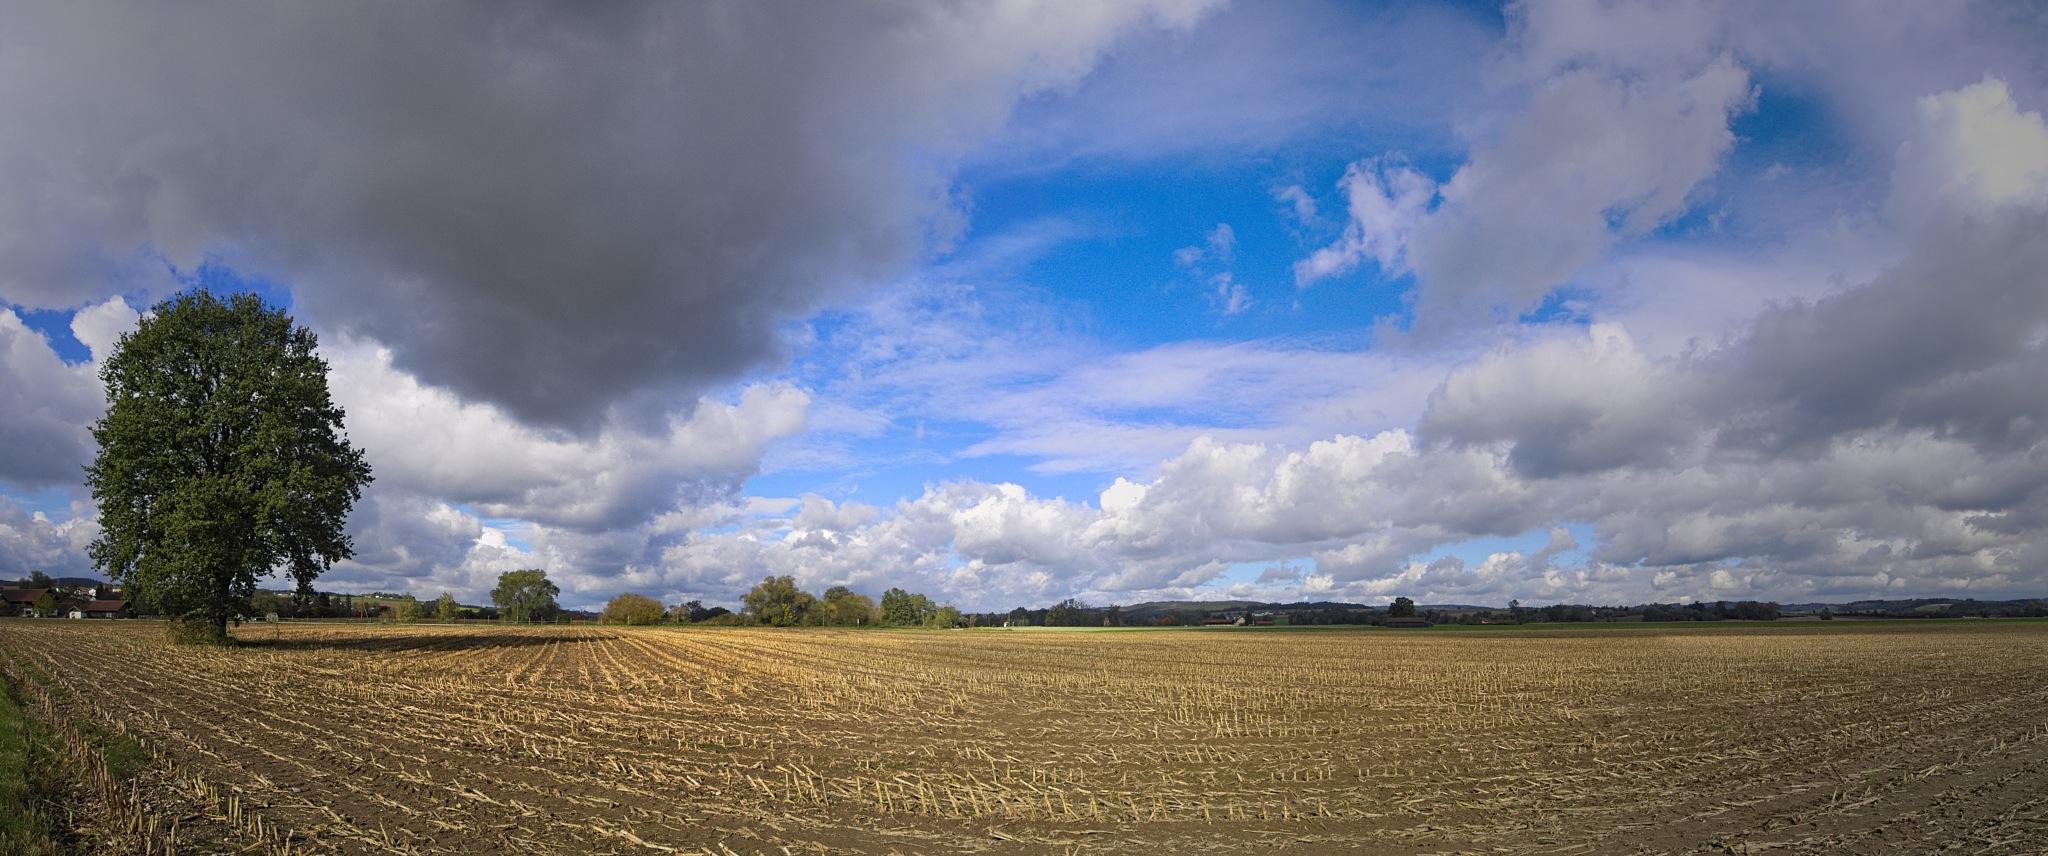 rural sky by koaxial